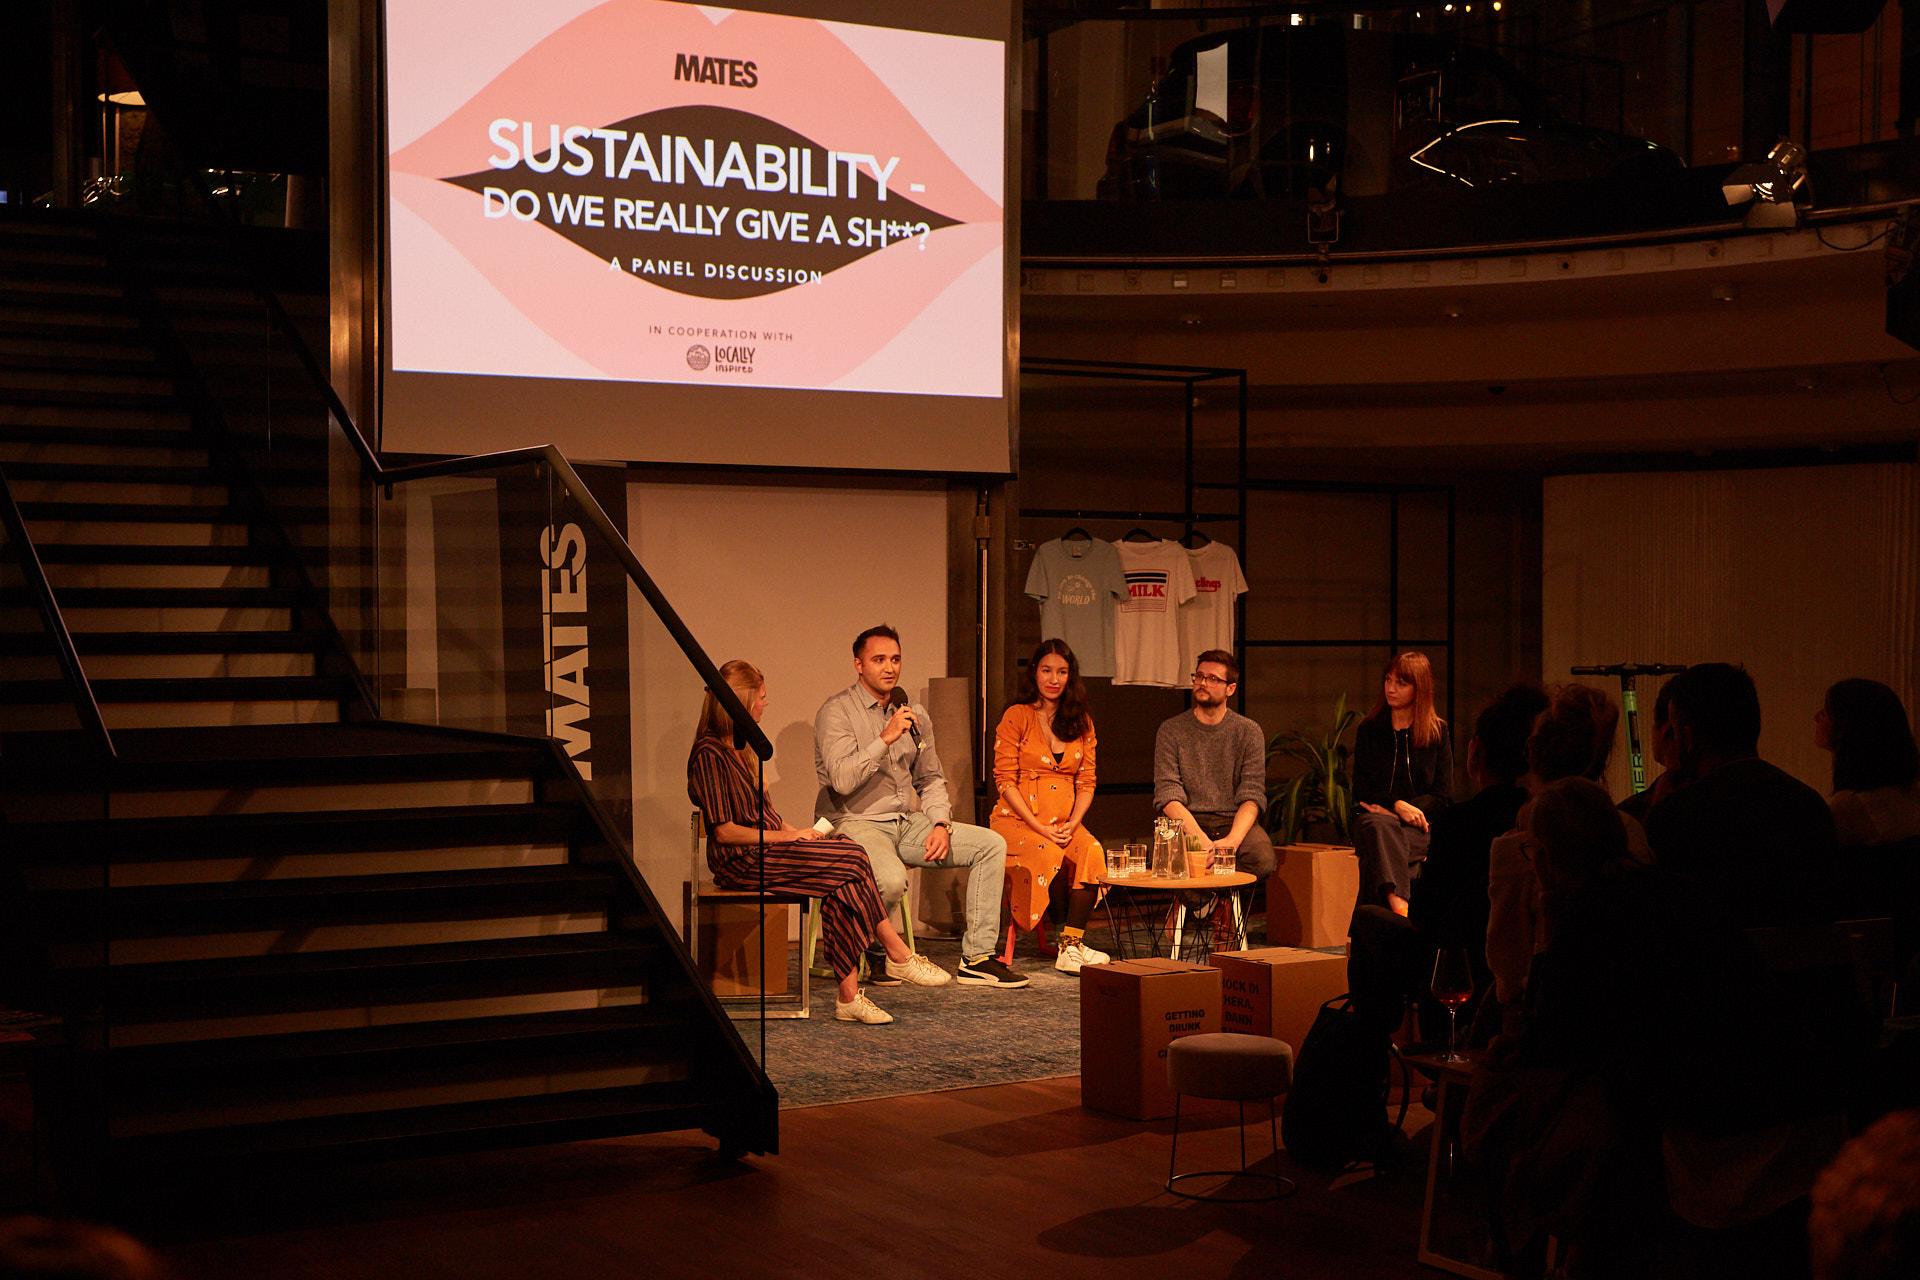 MATES sustainable design market muenchen 71